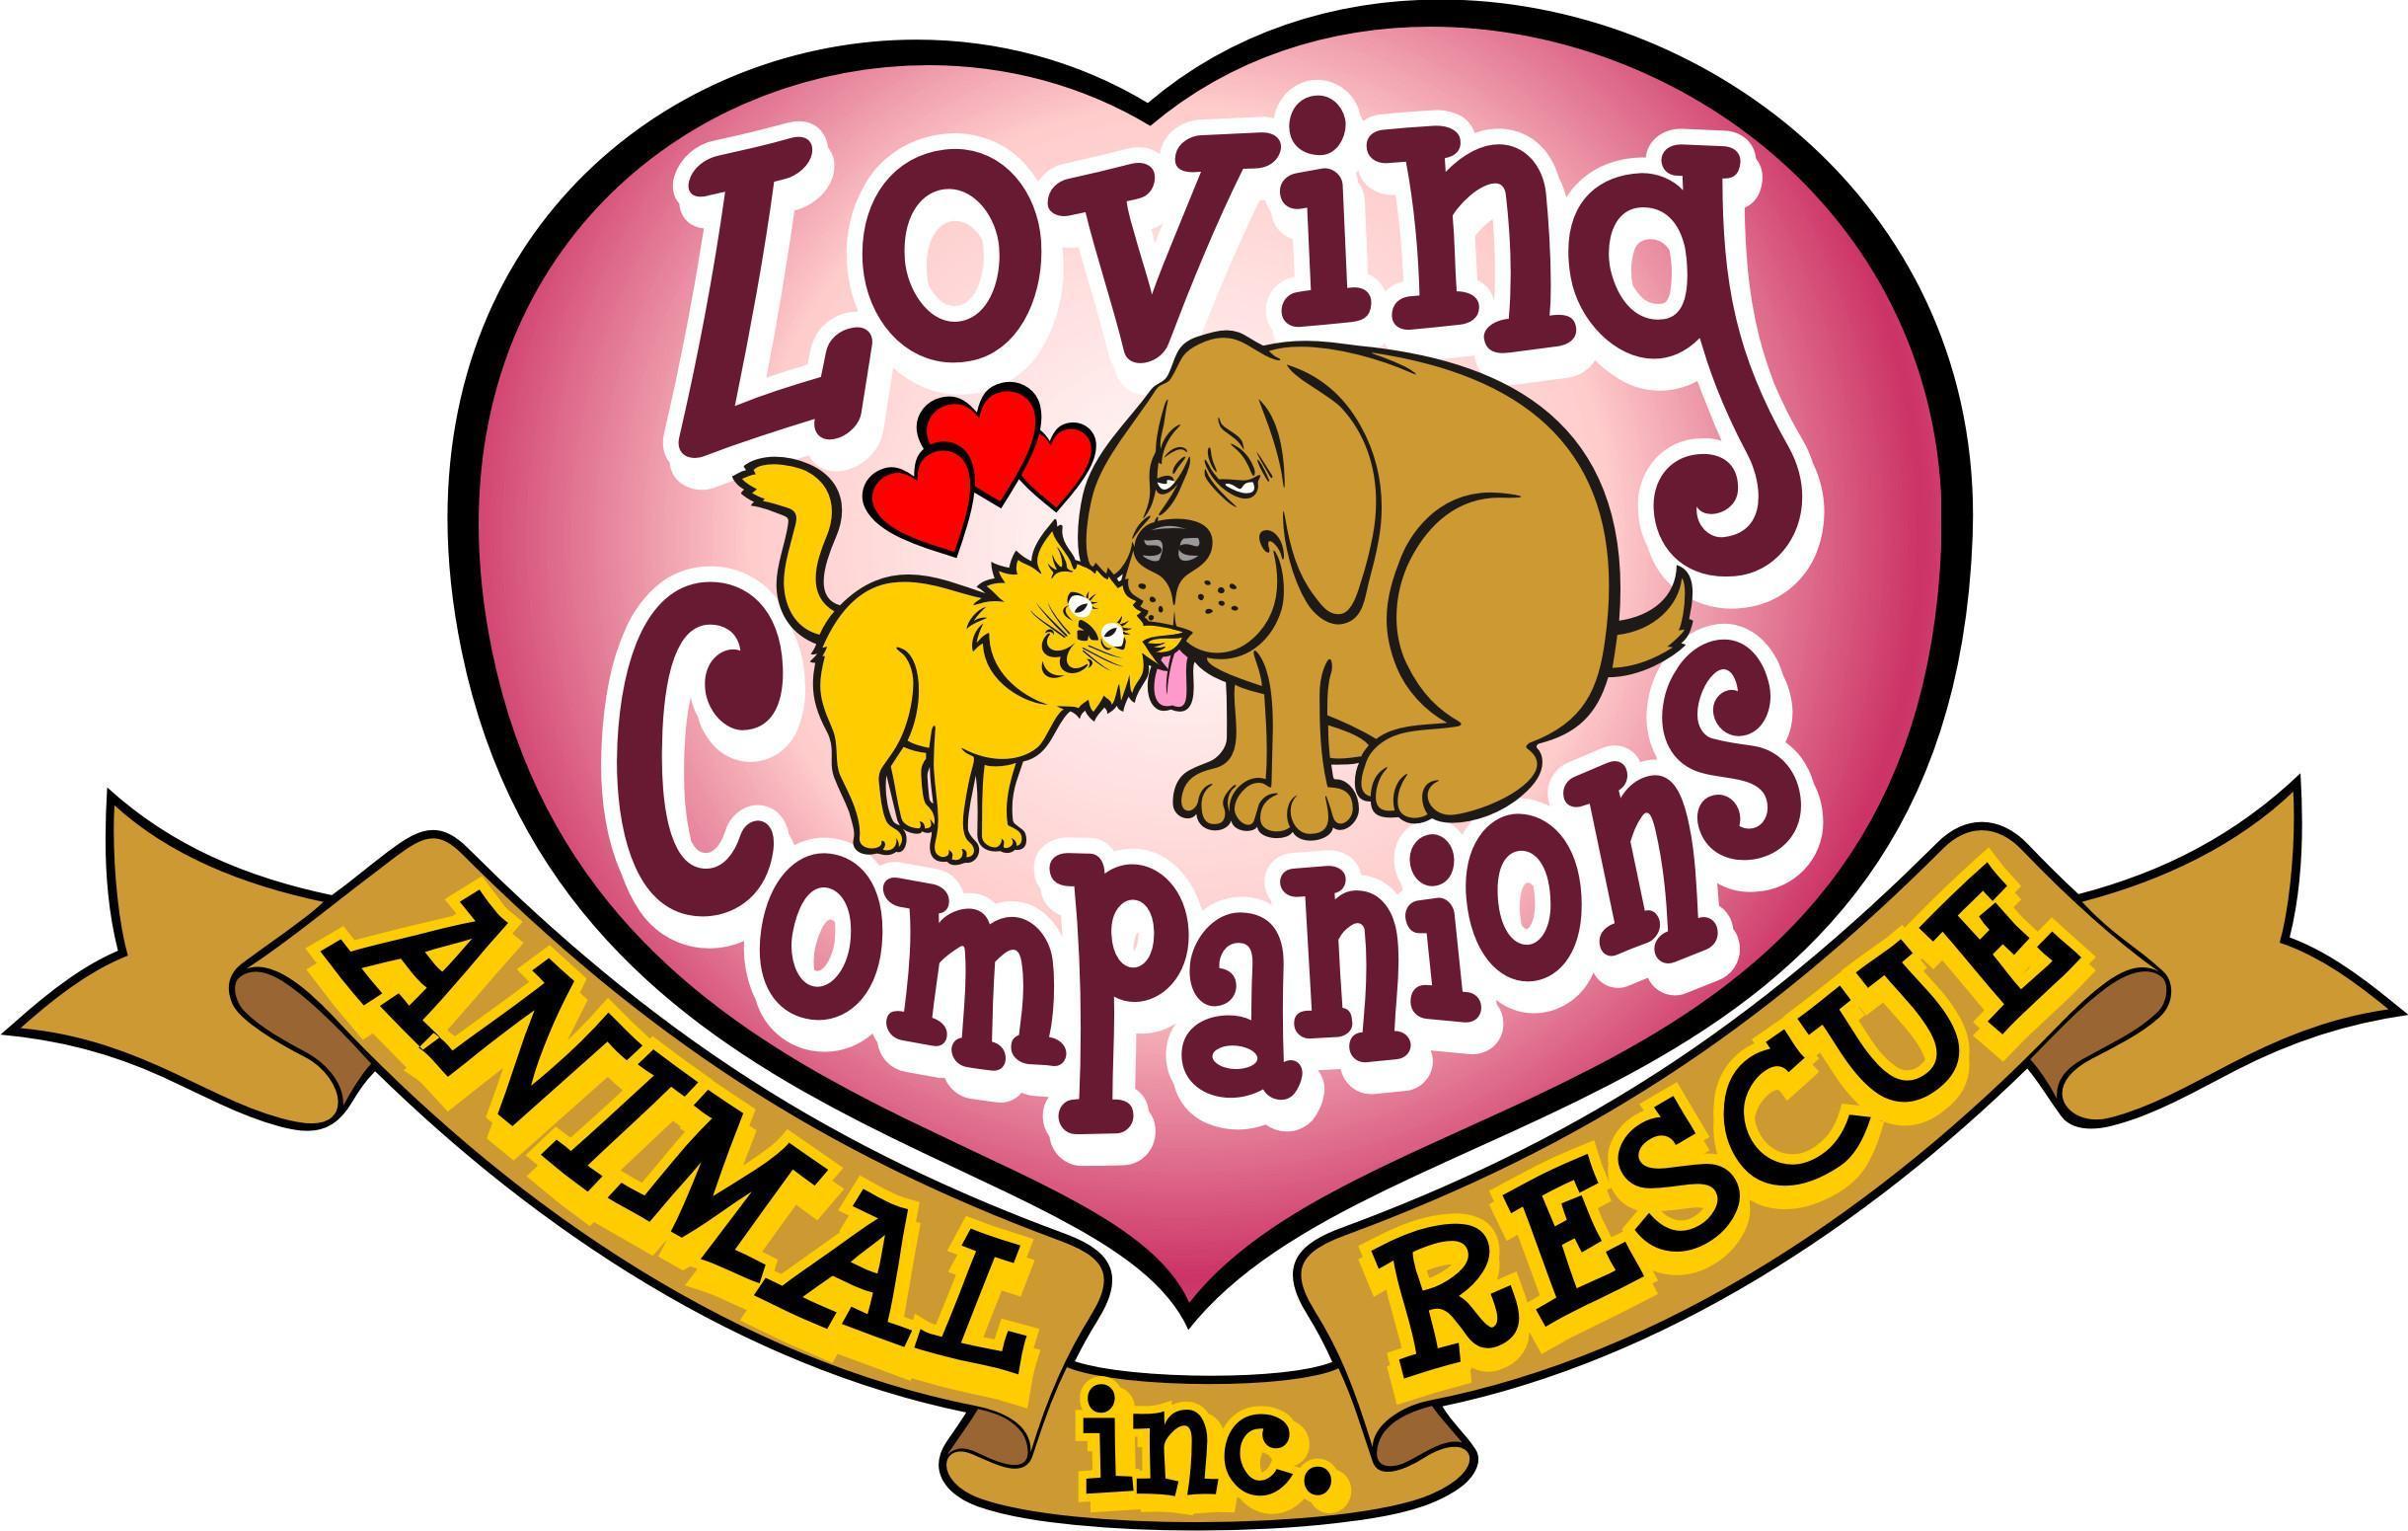 Loving Companions Animal Rescue Inc.